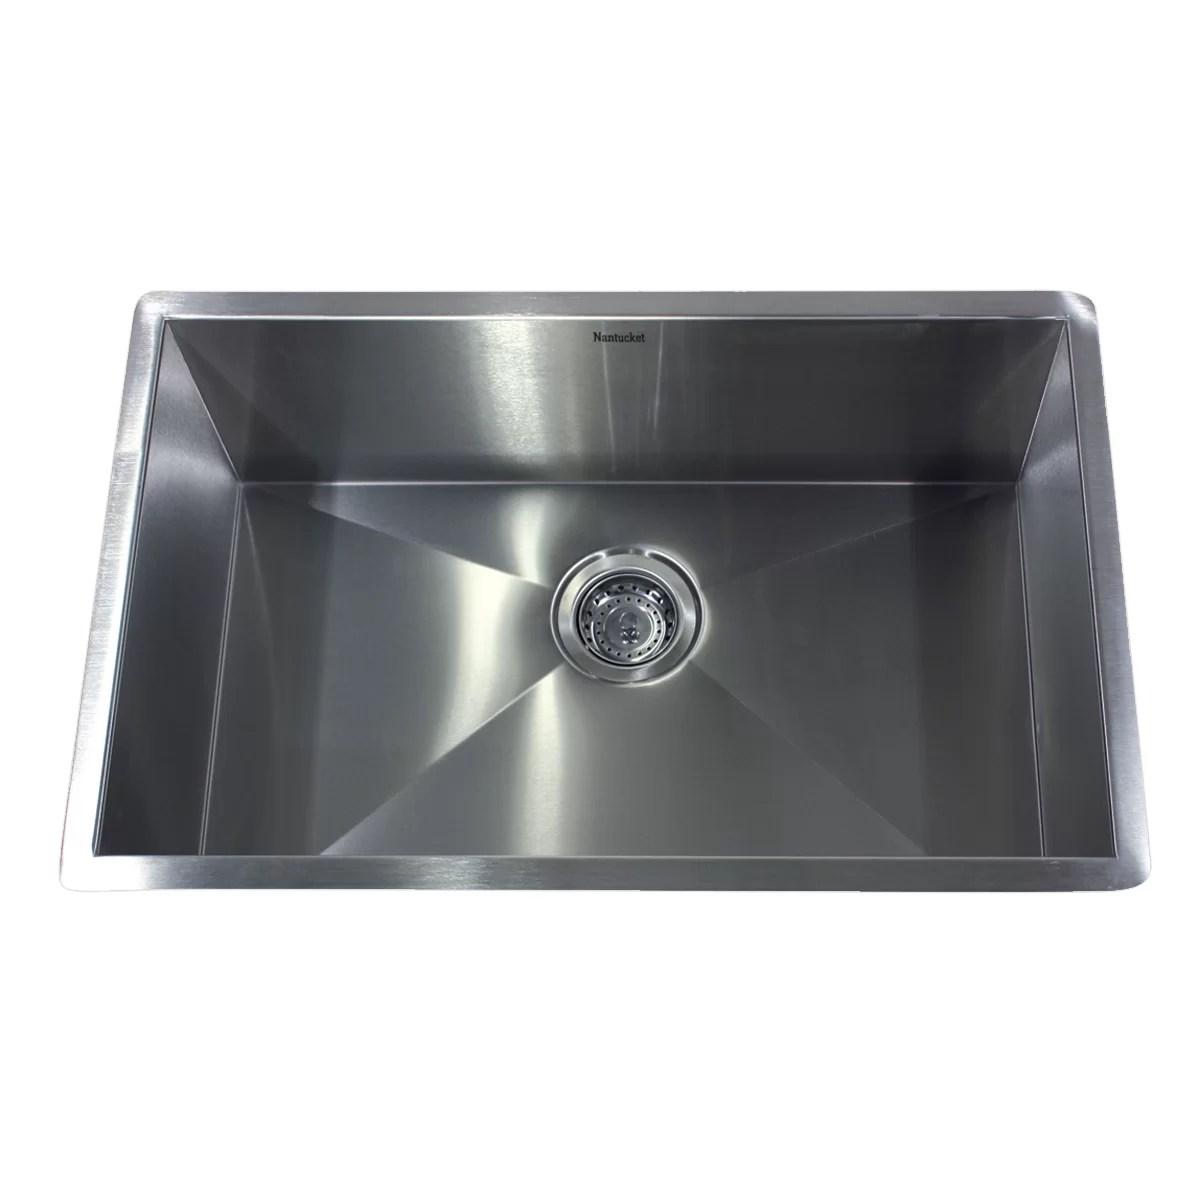 Nantucket Sinks 28quot X 18quot Zero Radius Large Single Bowl